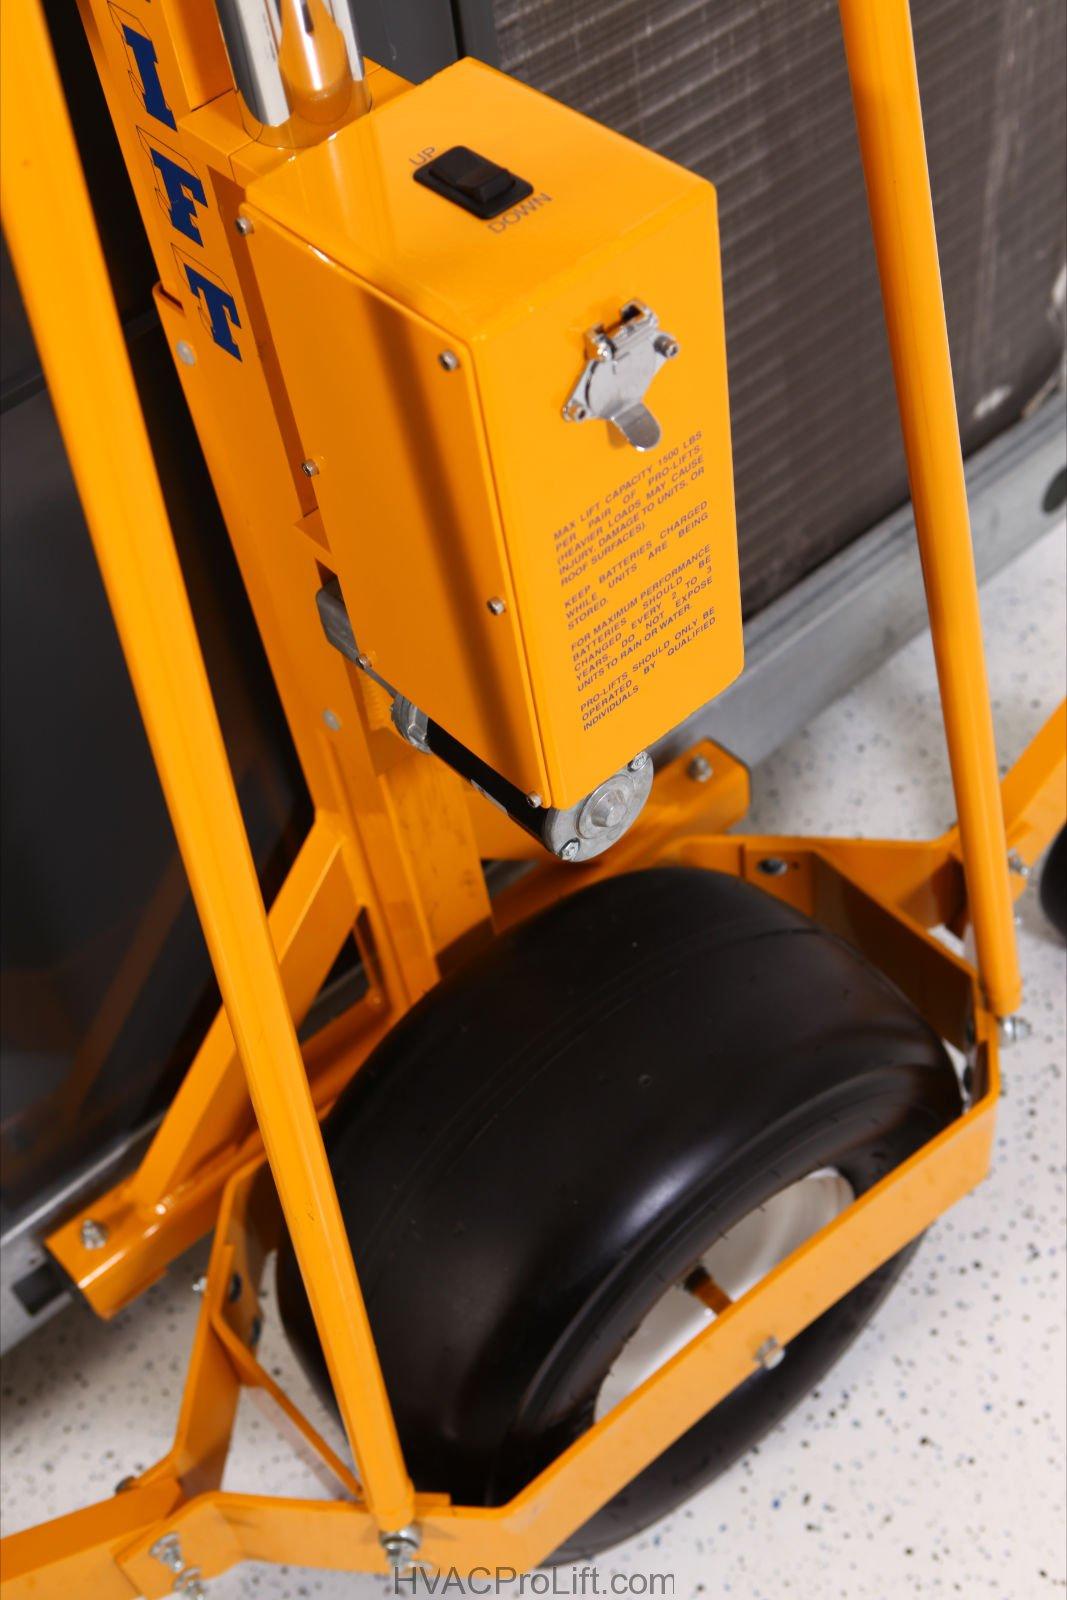 Pro Lift Main Wheel & Control Box